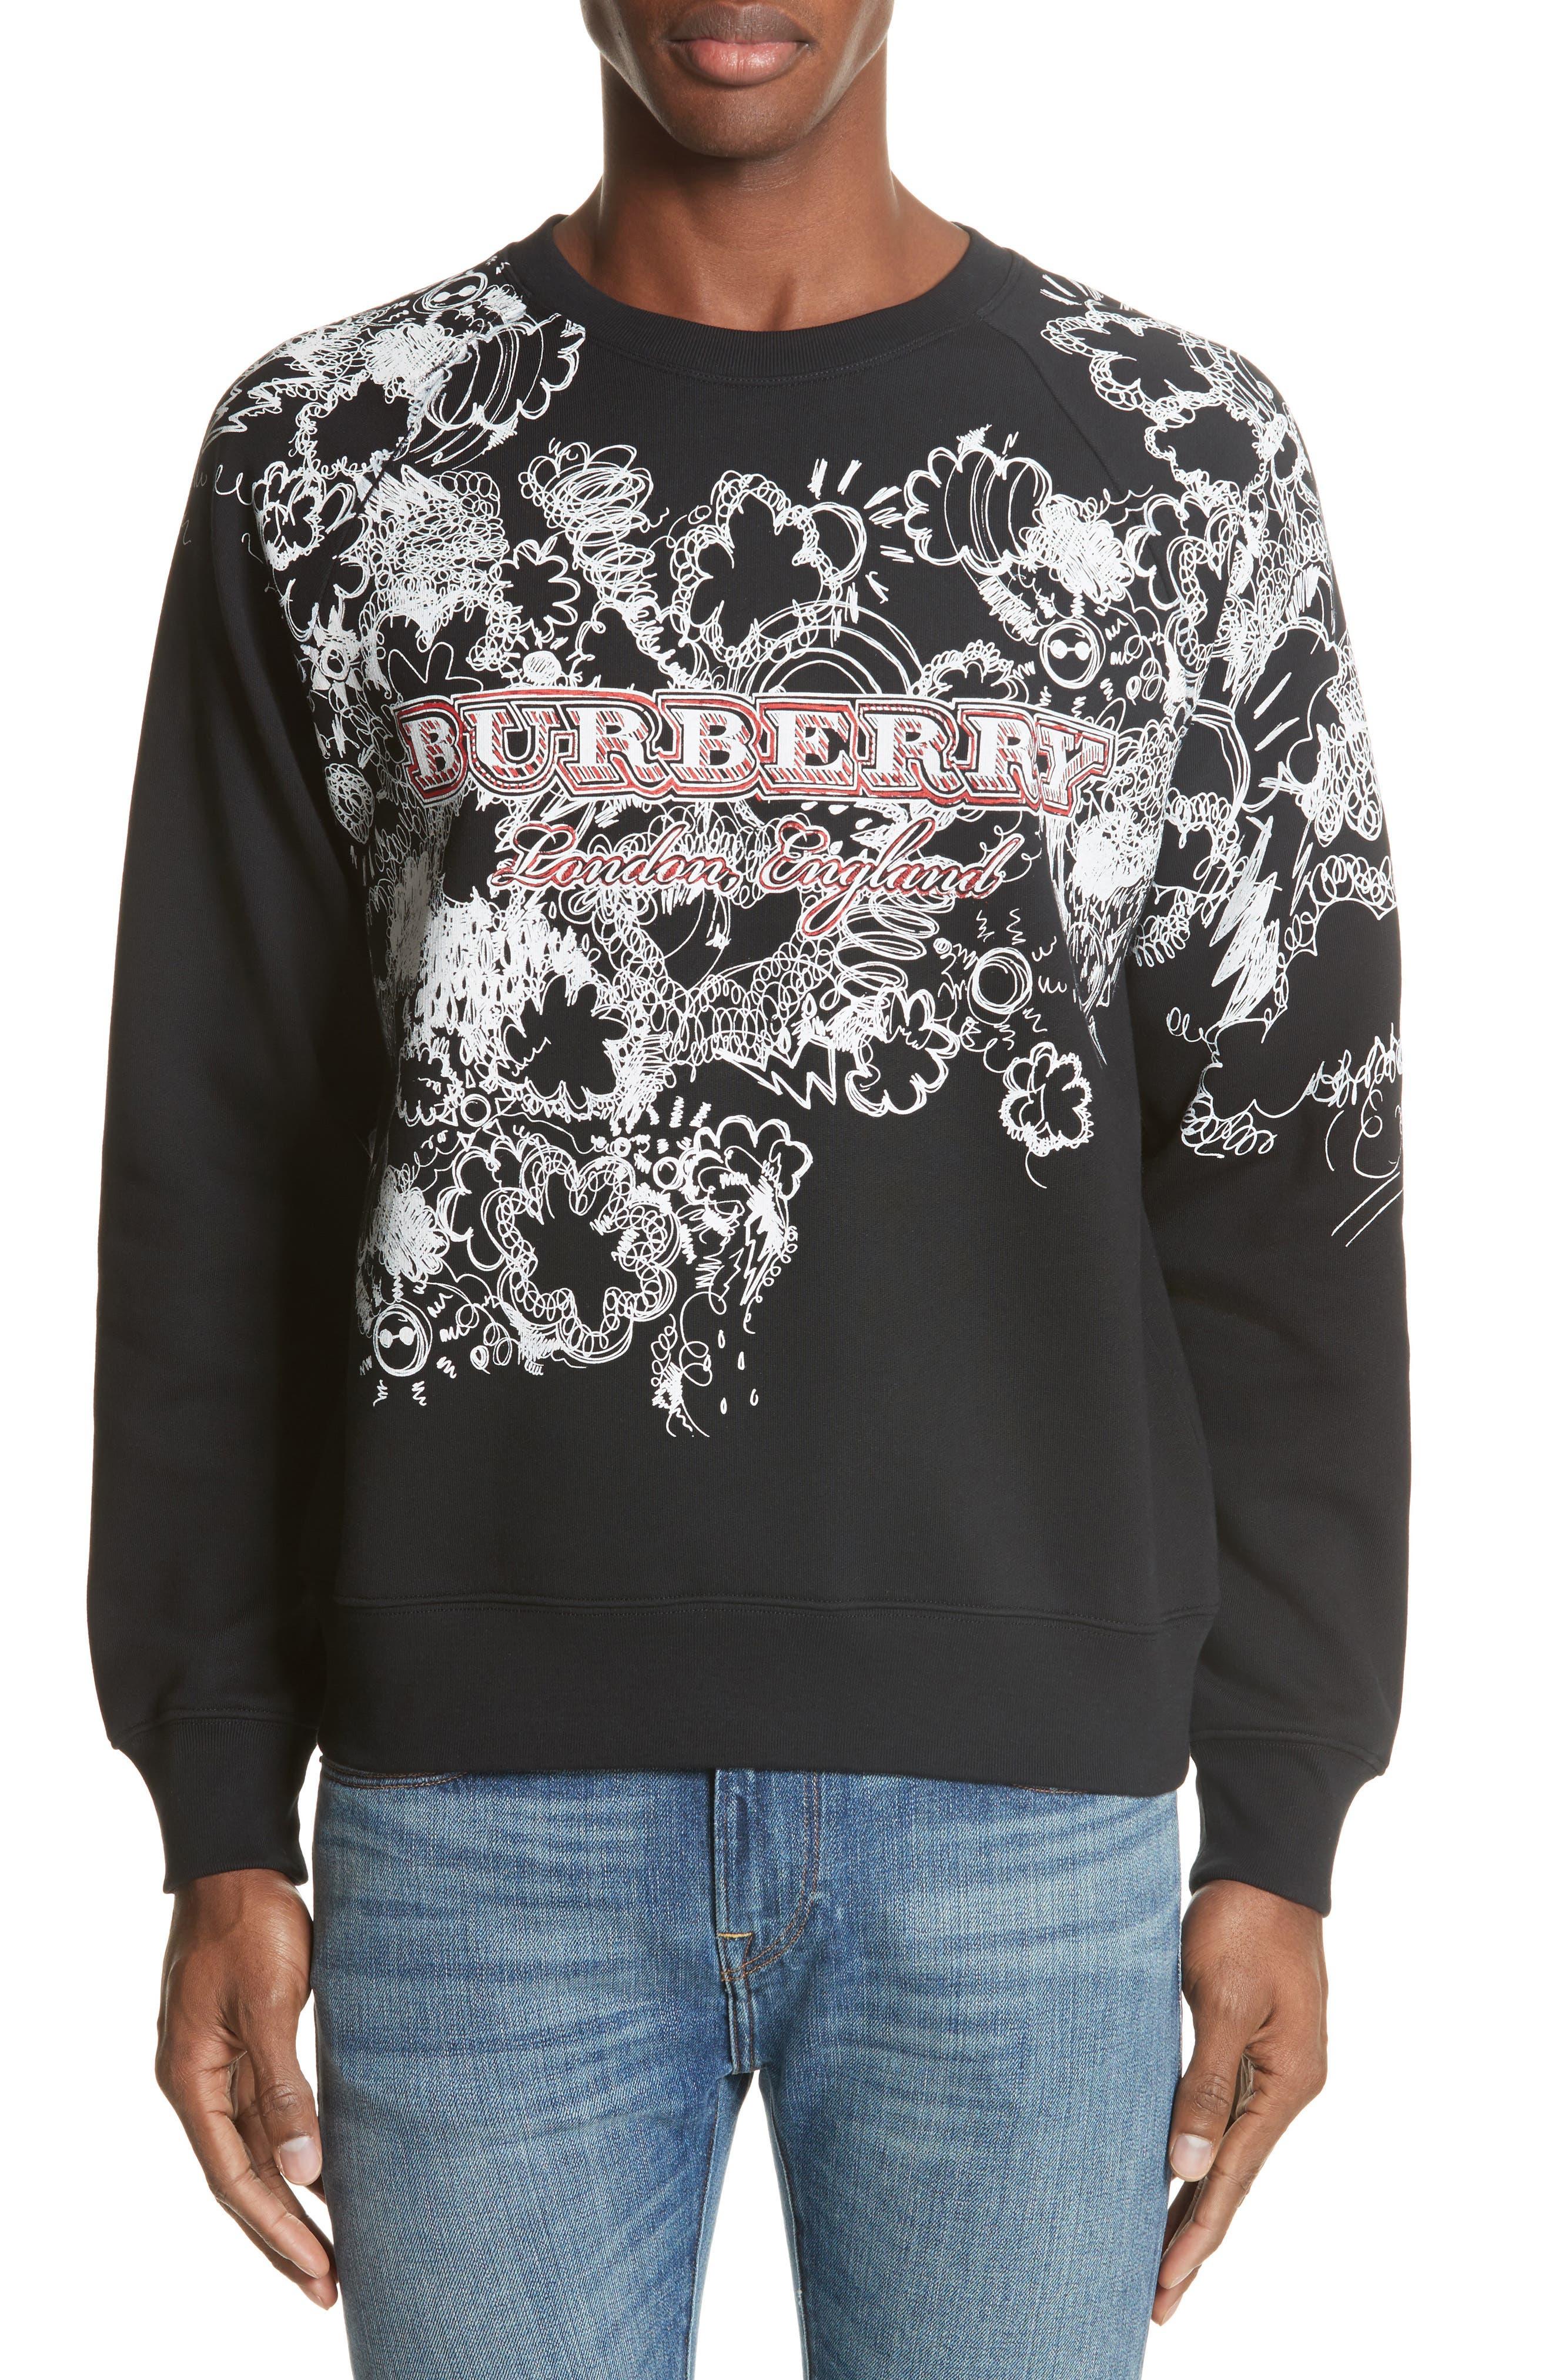 Main Image - Burberry Barford Crewneck Sweatshirt